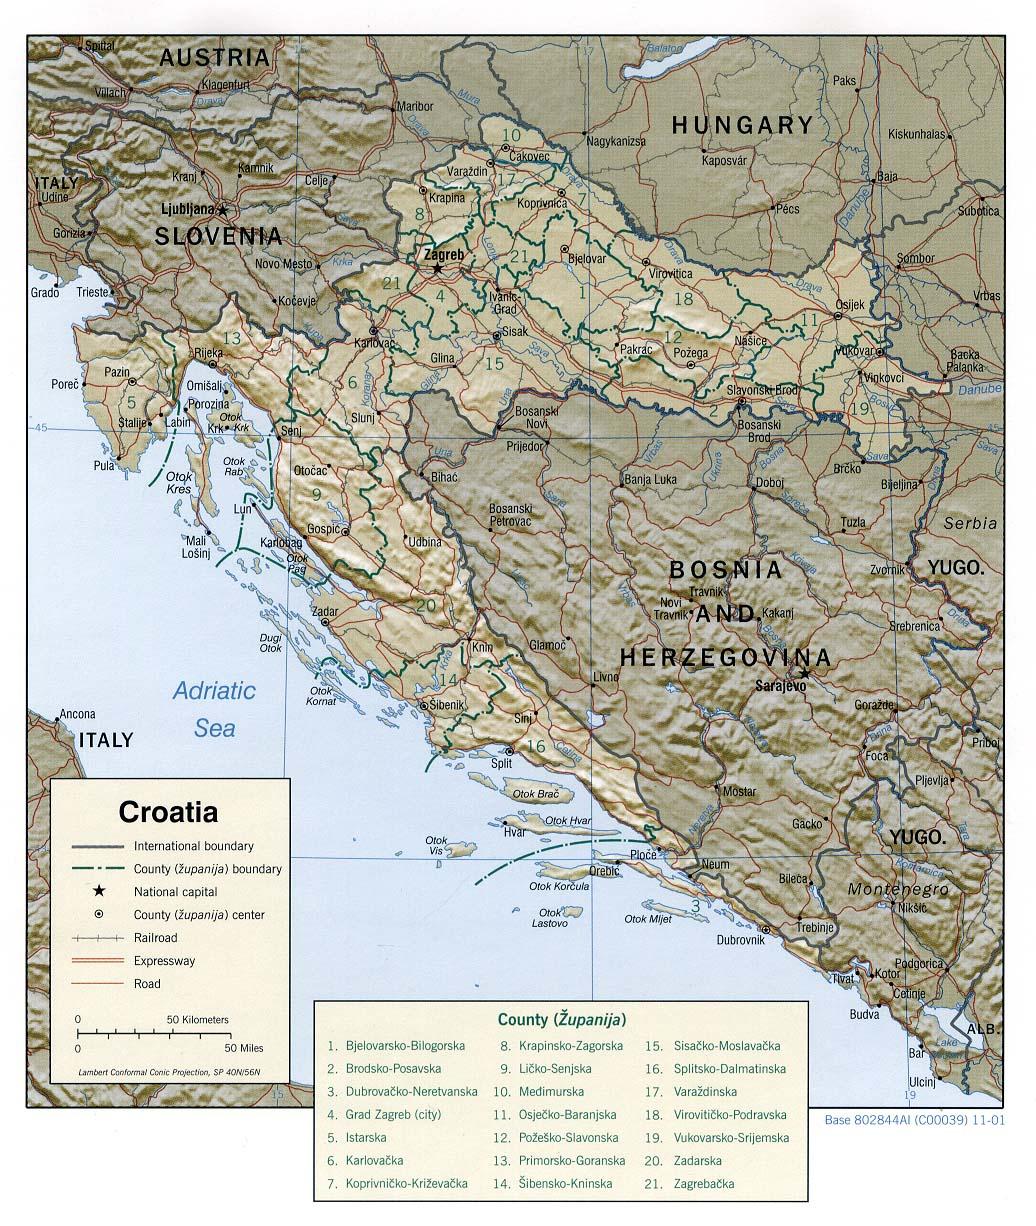 Mapa Grande da Croácia